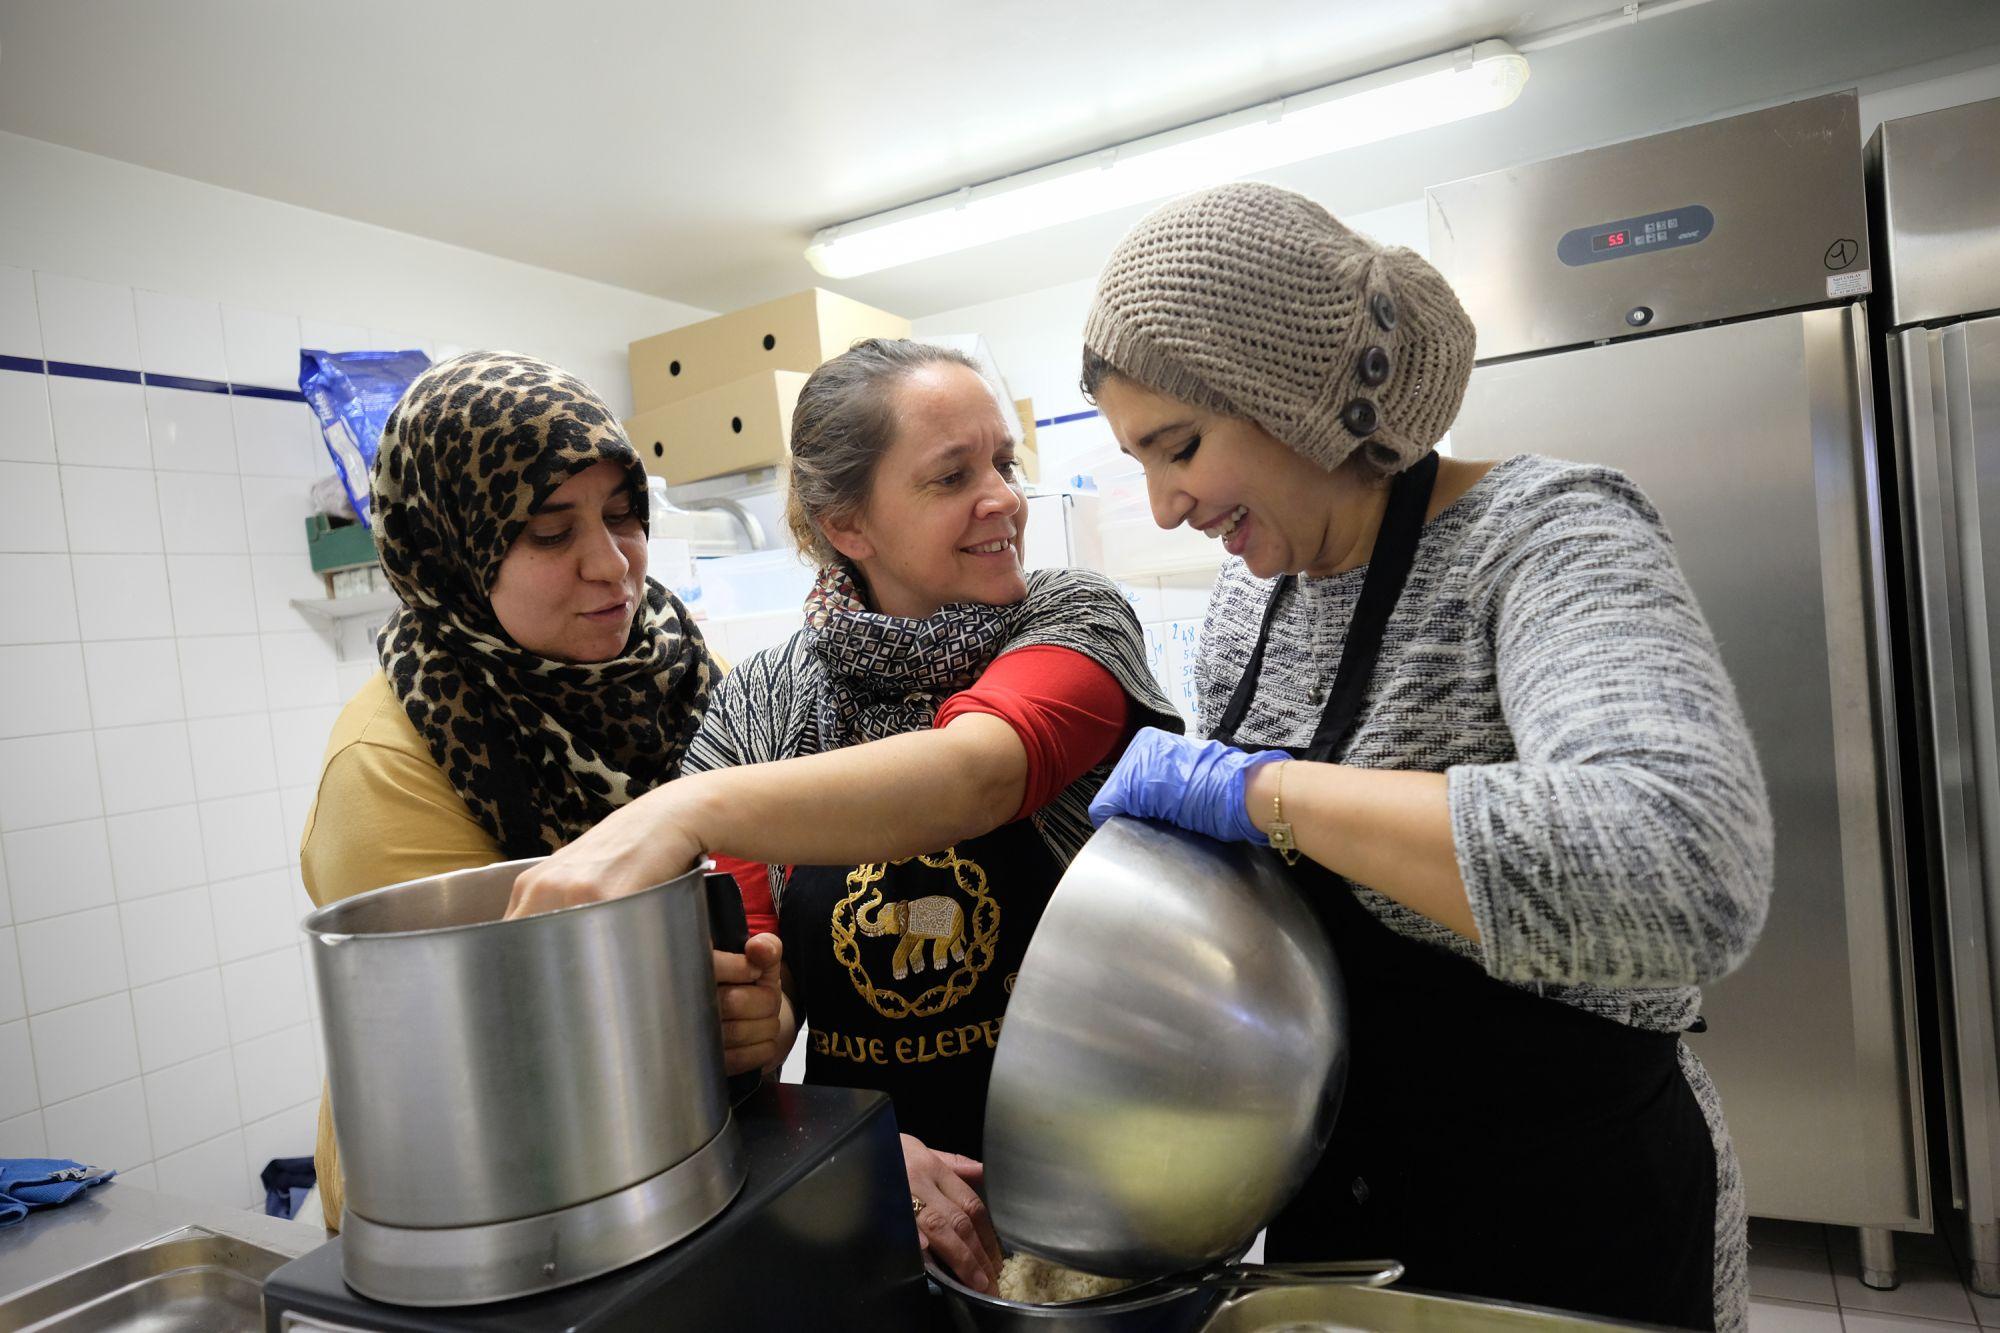 Le Grand T - Resto - Cuisine égyptienne